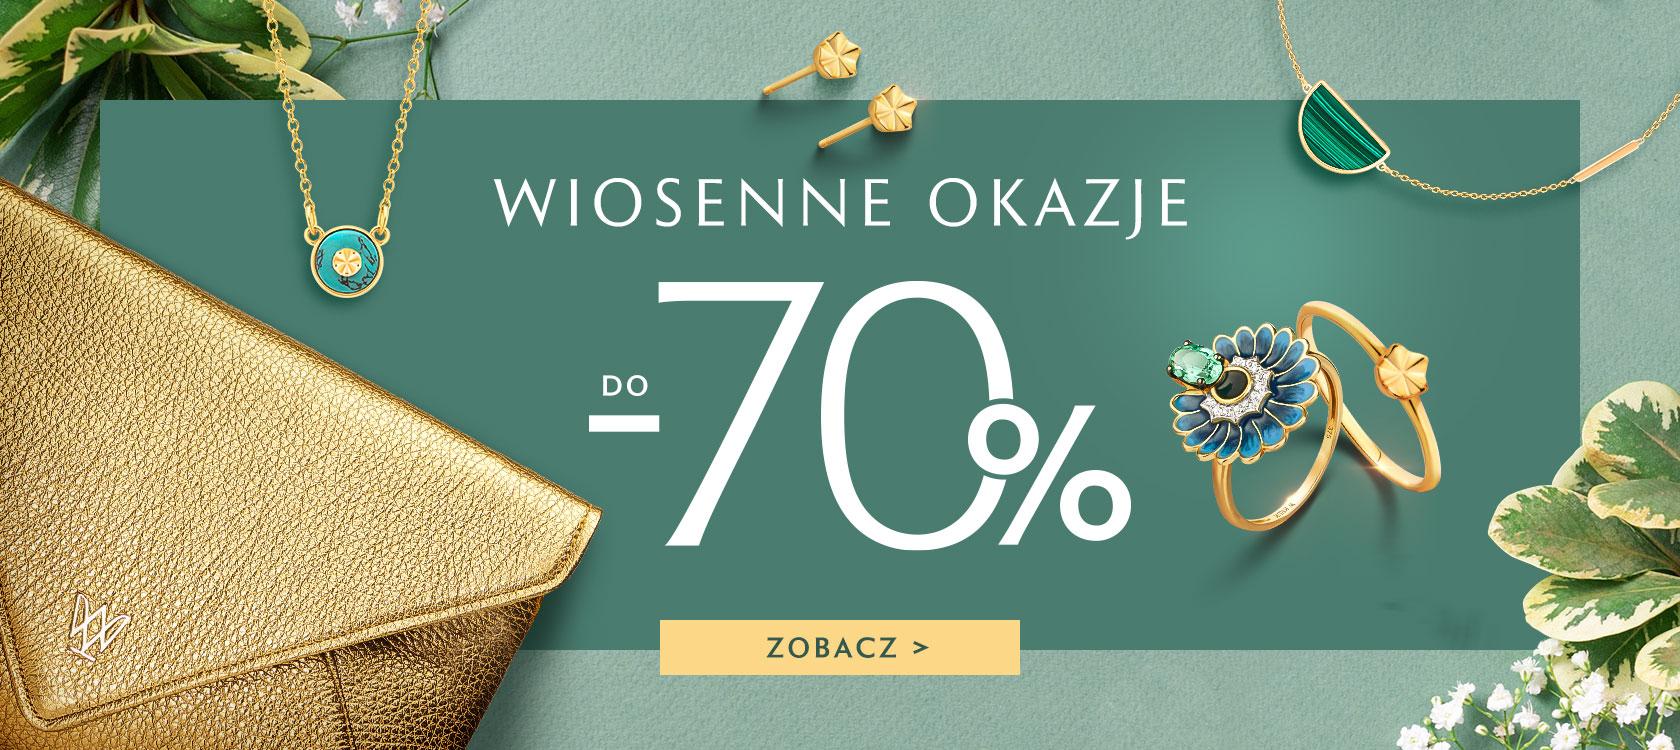 W.Kruk: do 70% rabatu na biżuterię, torebki, portfele i inne akcesoria